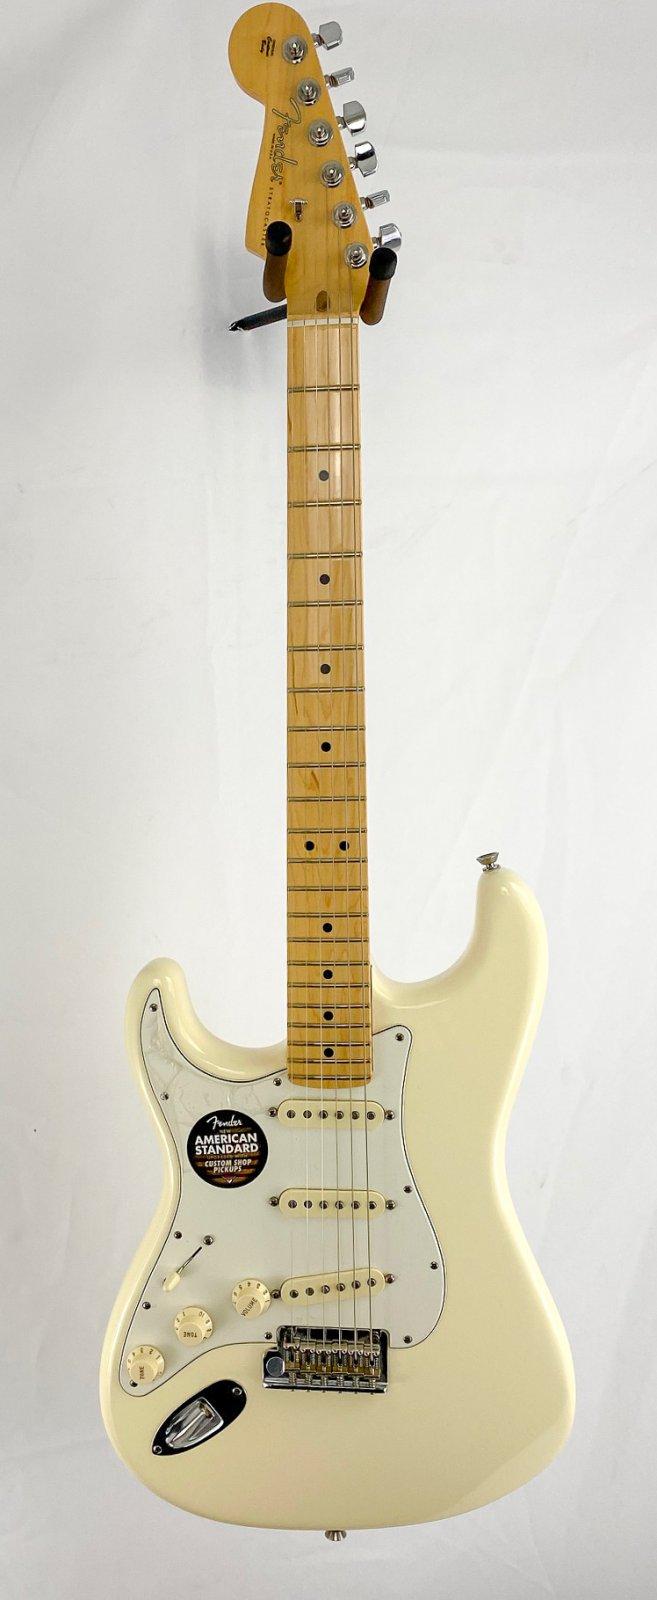 2012 Fender American Standard Strat - lefty w/gigbag